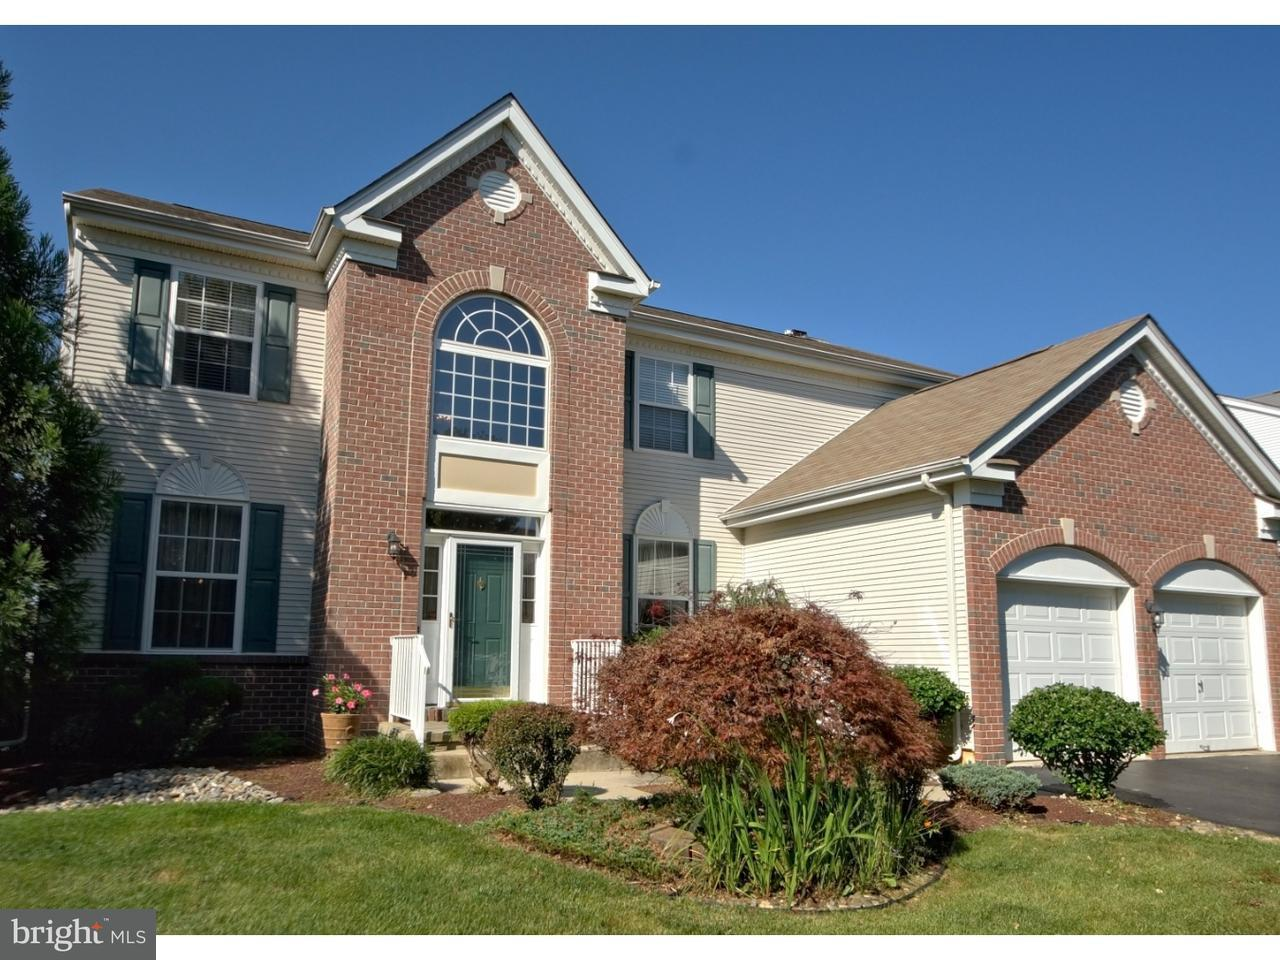 独户住宅 为 销售 在 28 HERITAGE Drive Allentown, 新泽西州 08501 美国在/周边: Upper Freehold Township